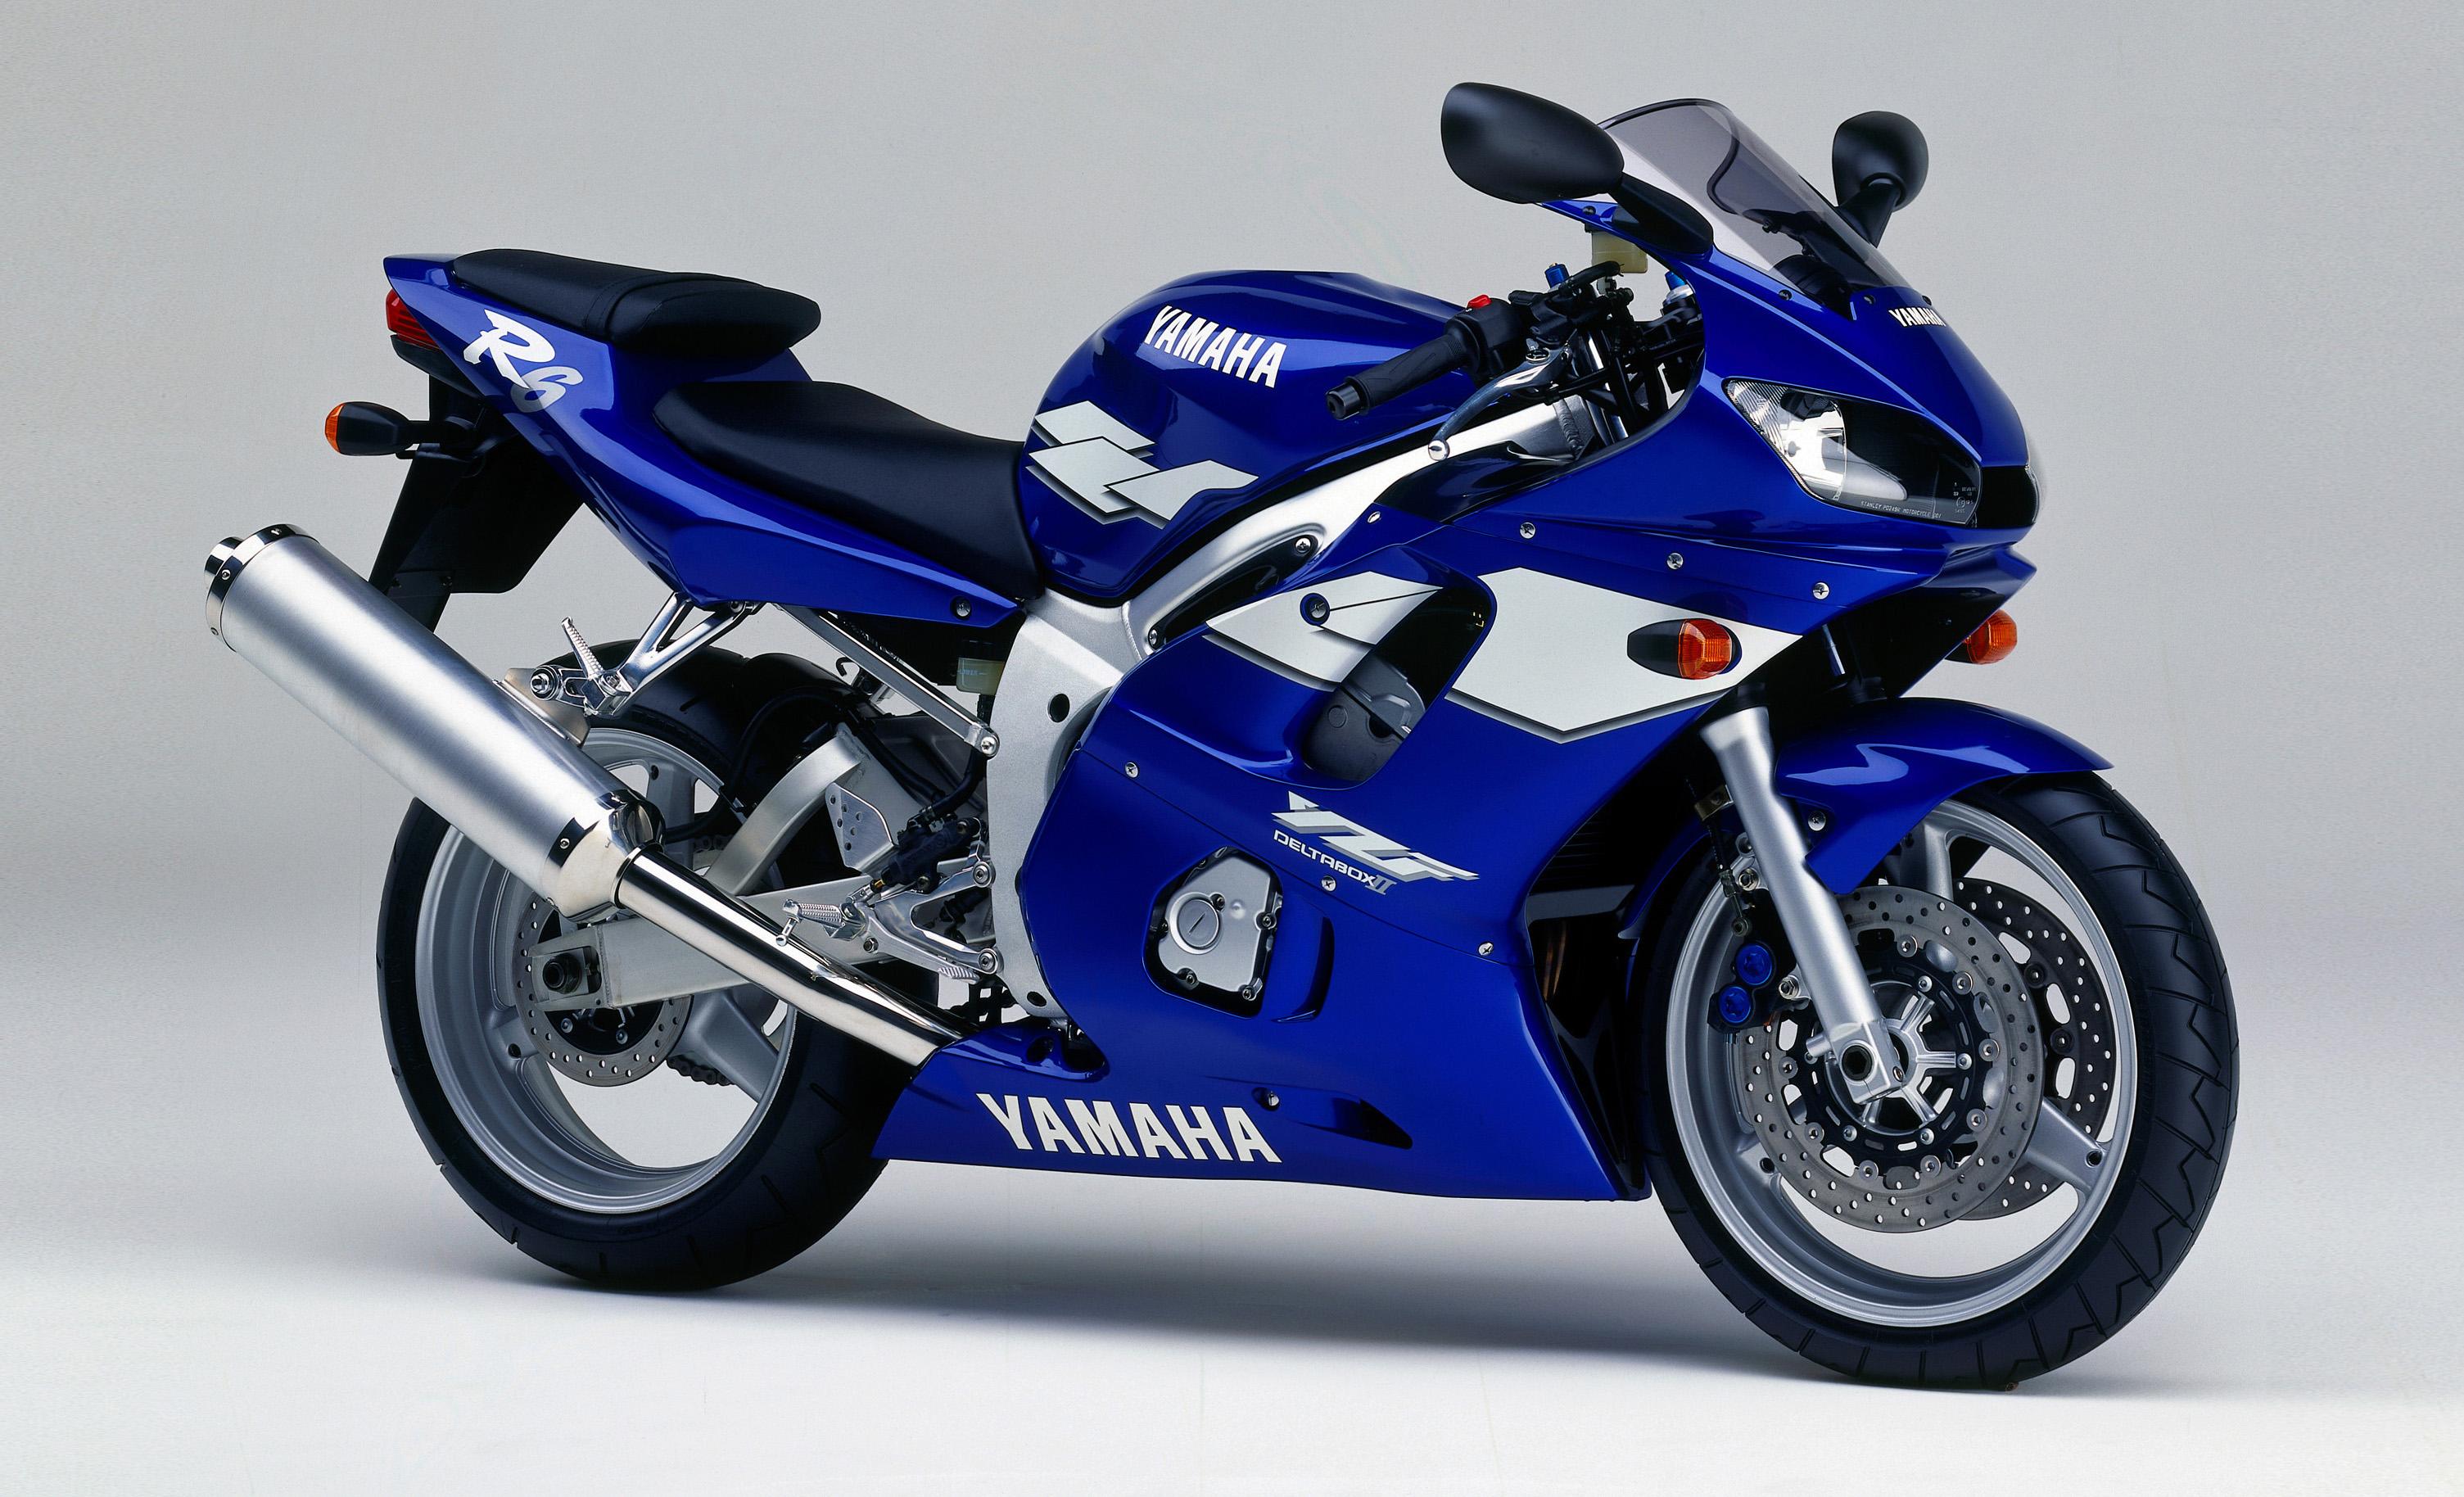 YZF-R6 (1999 - 2002) review | Visordown